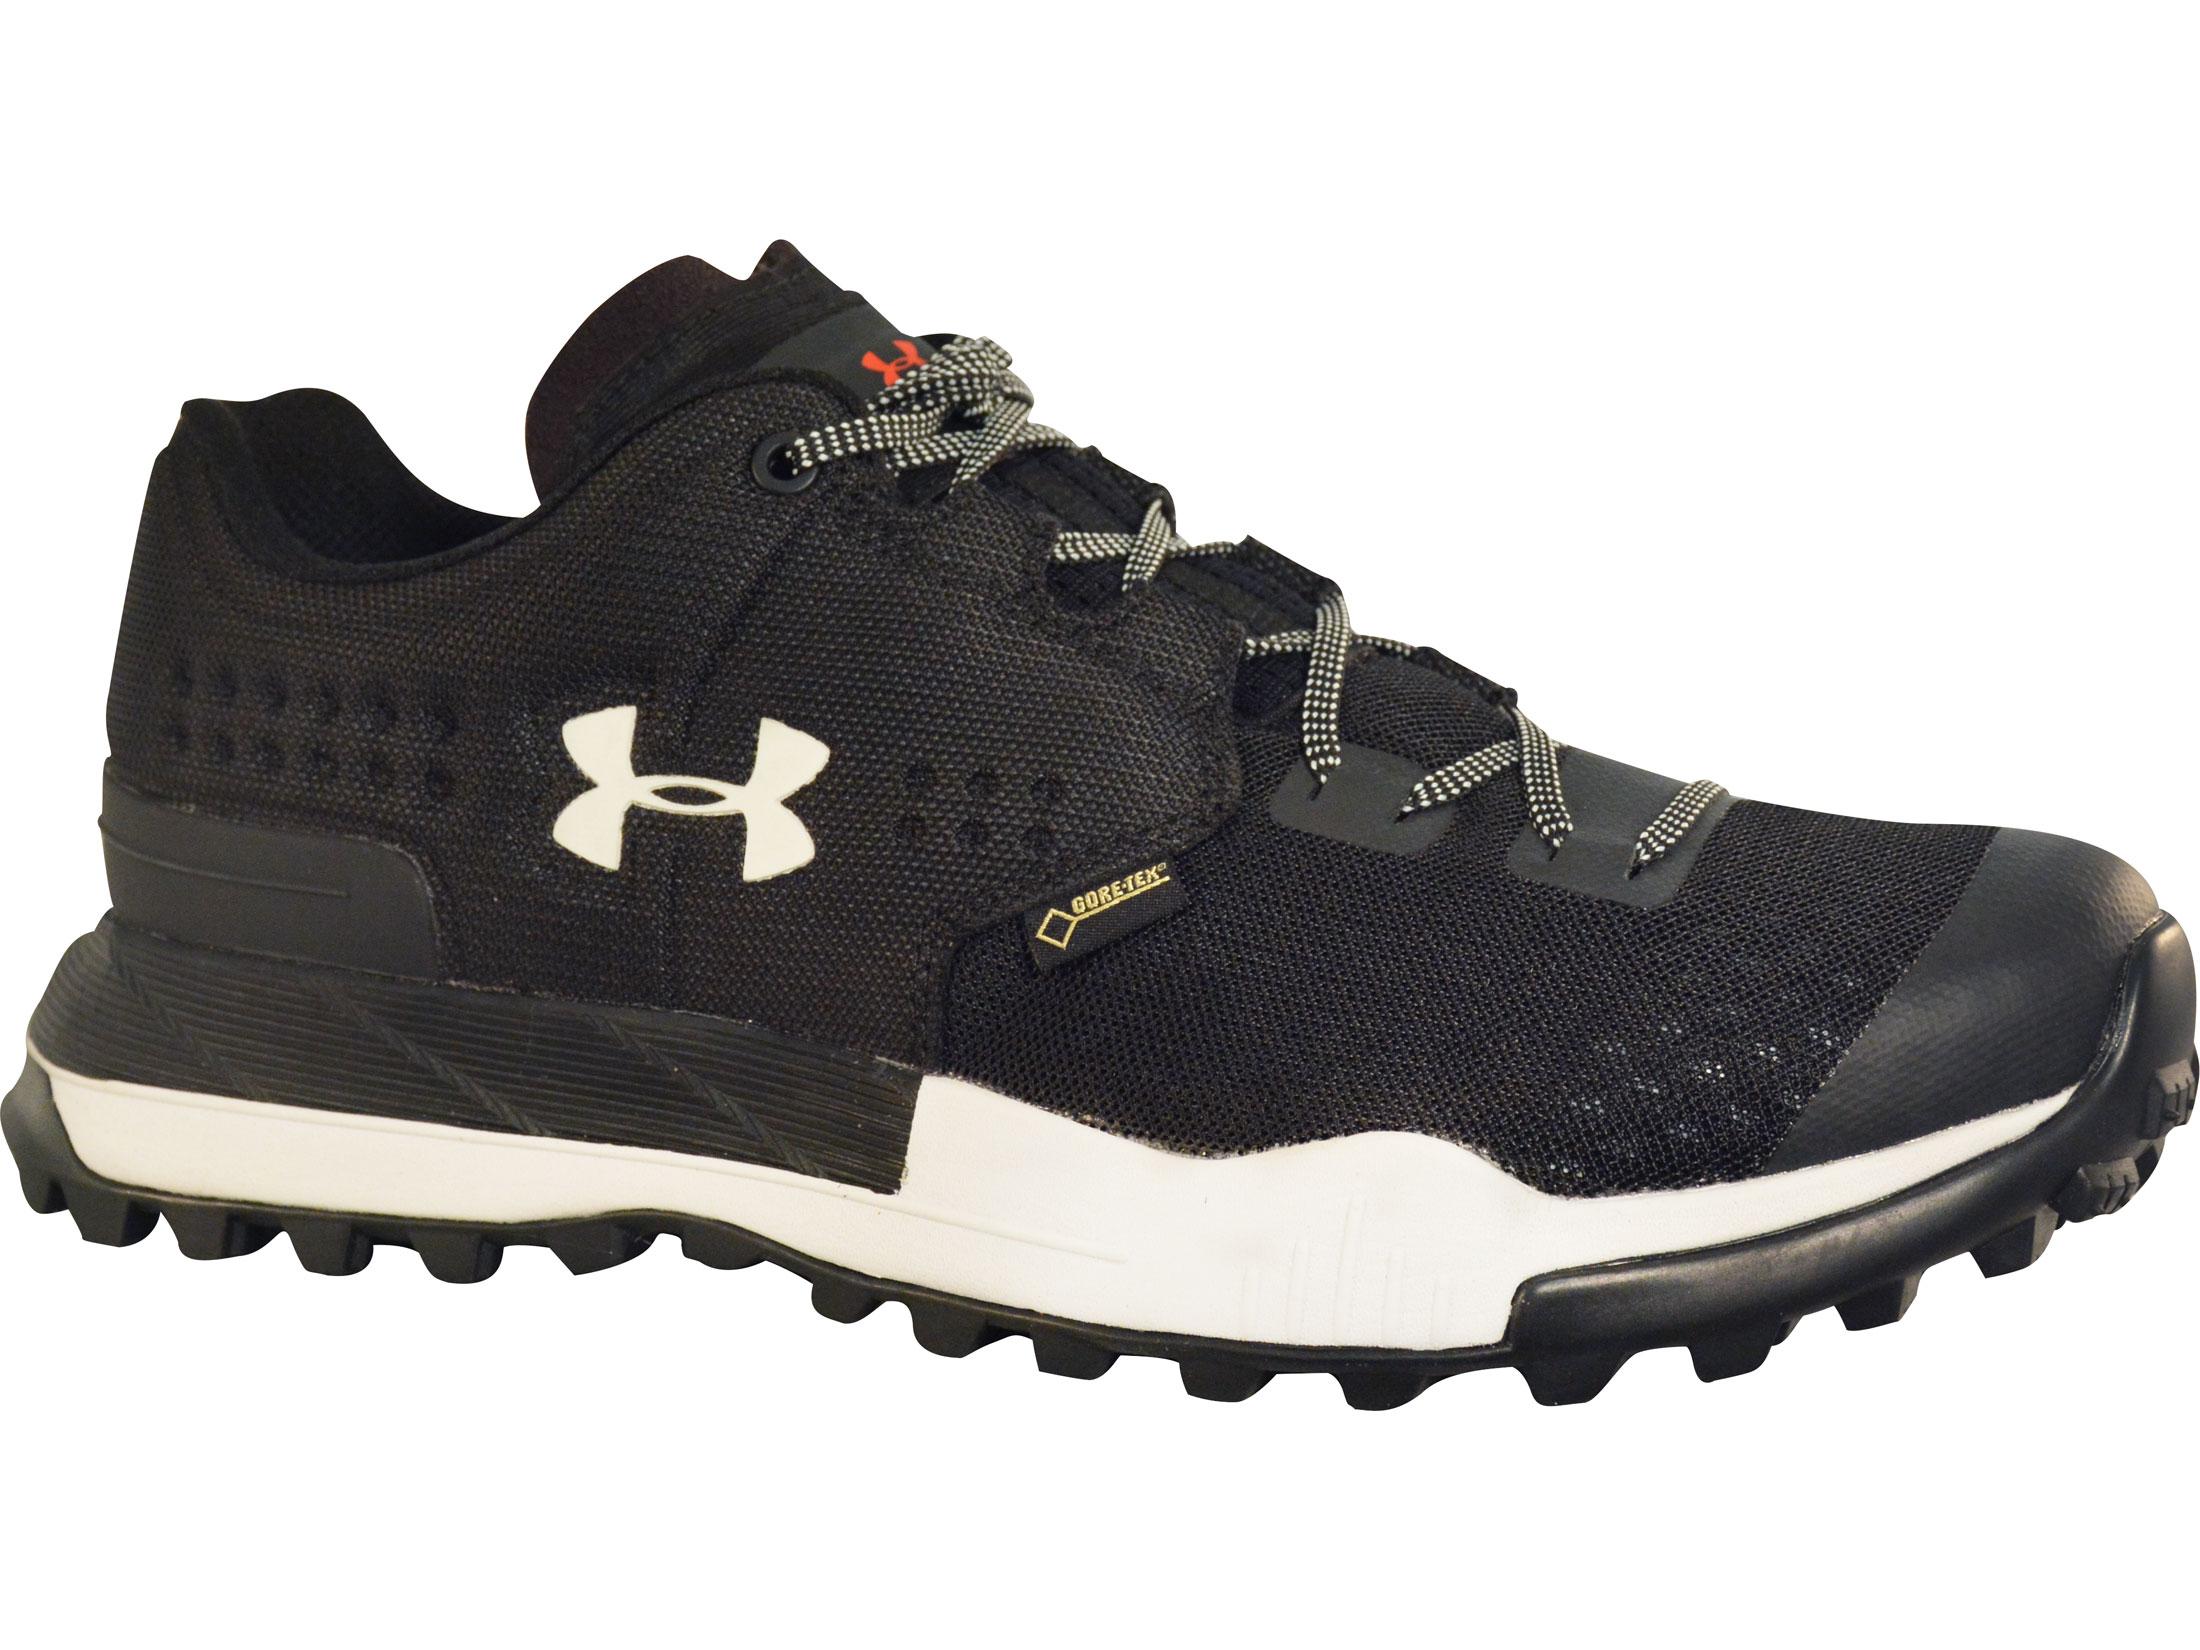 c70ebe8364c Under Armour UA Newell Ridge Low GTX 4 Waterproof Hiking Shoes